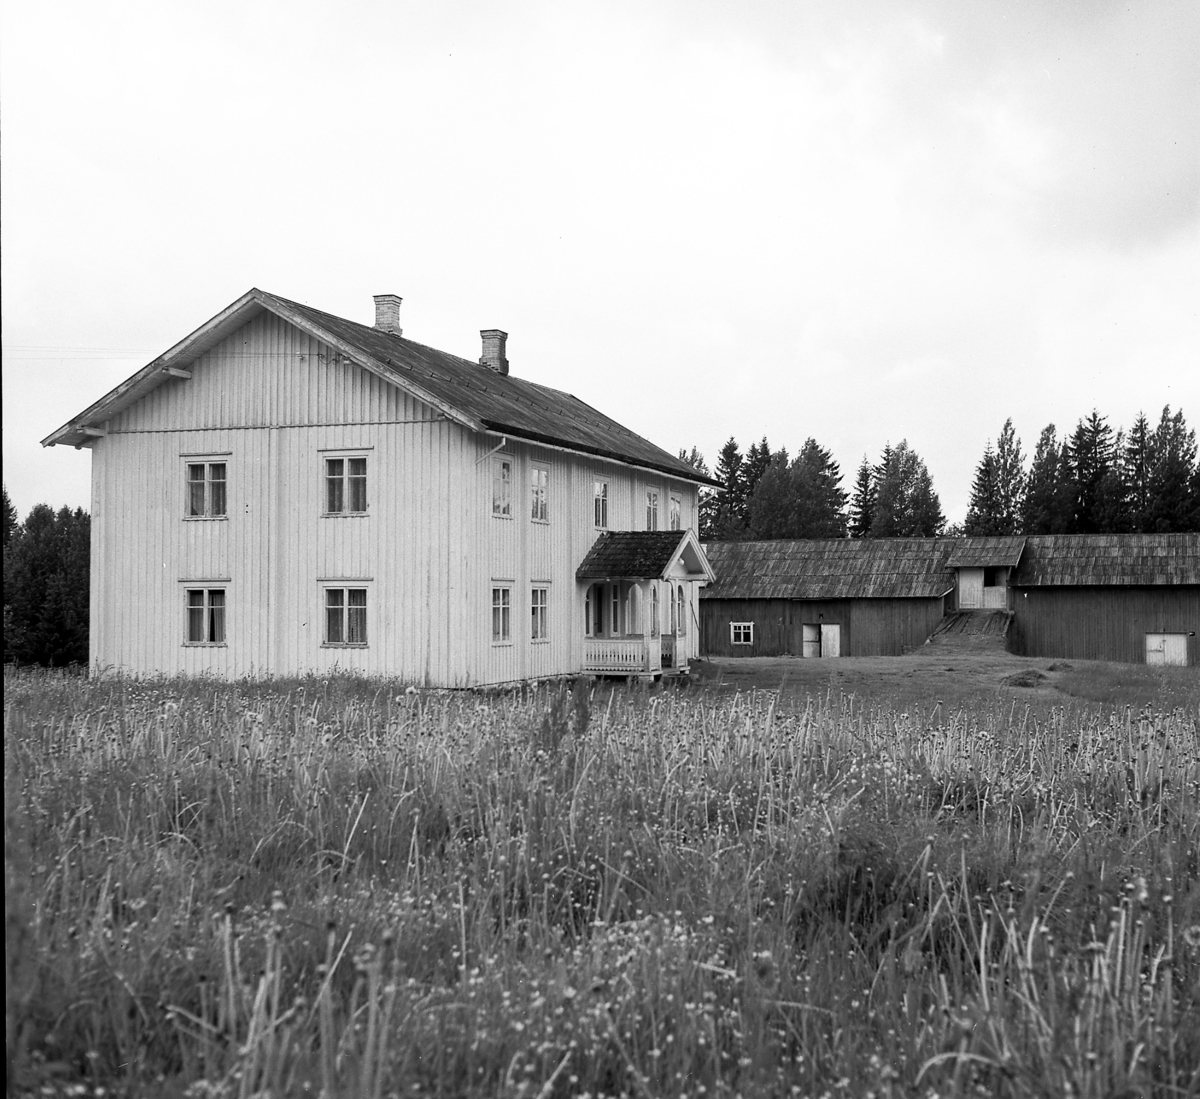 Risberget